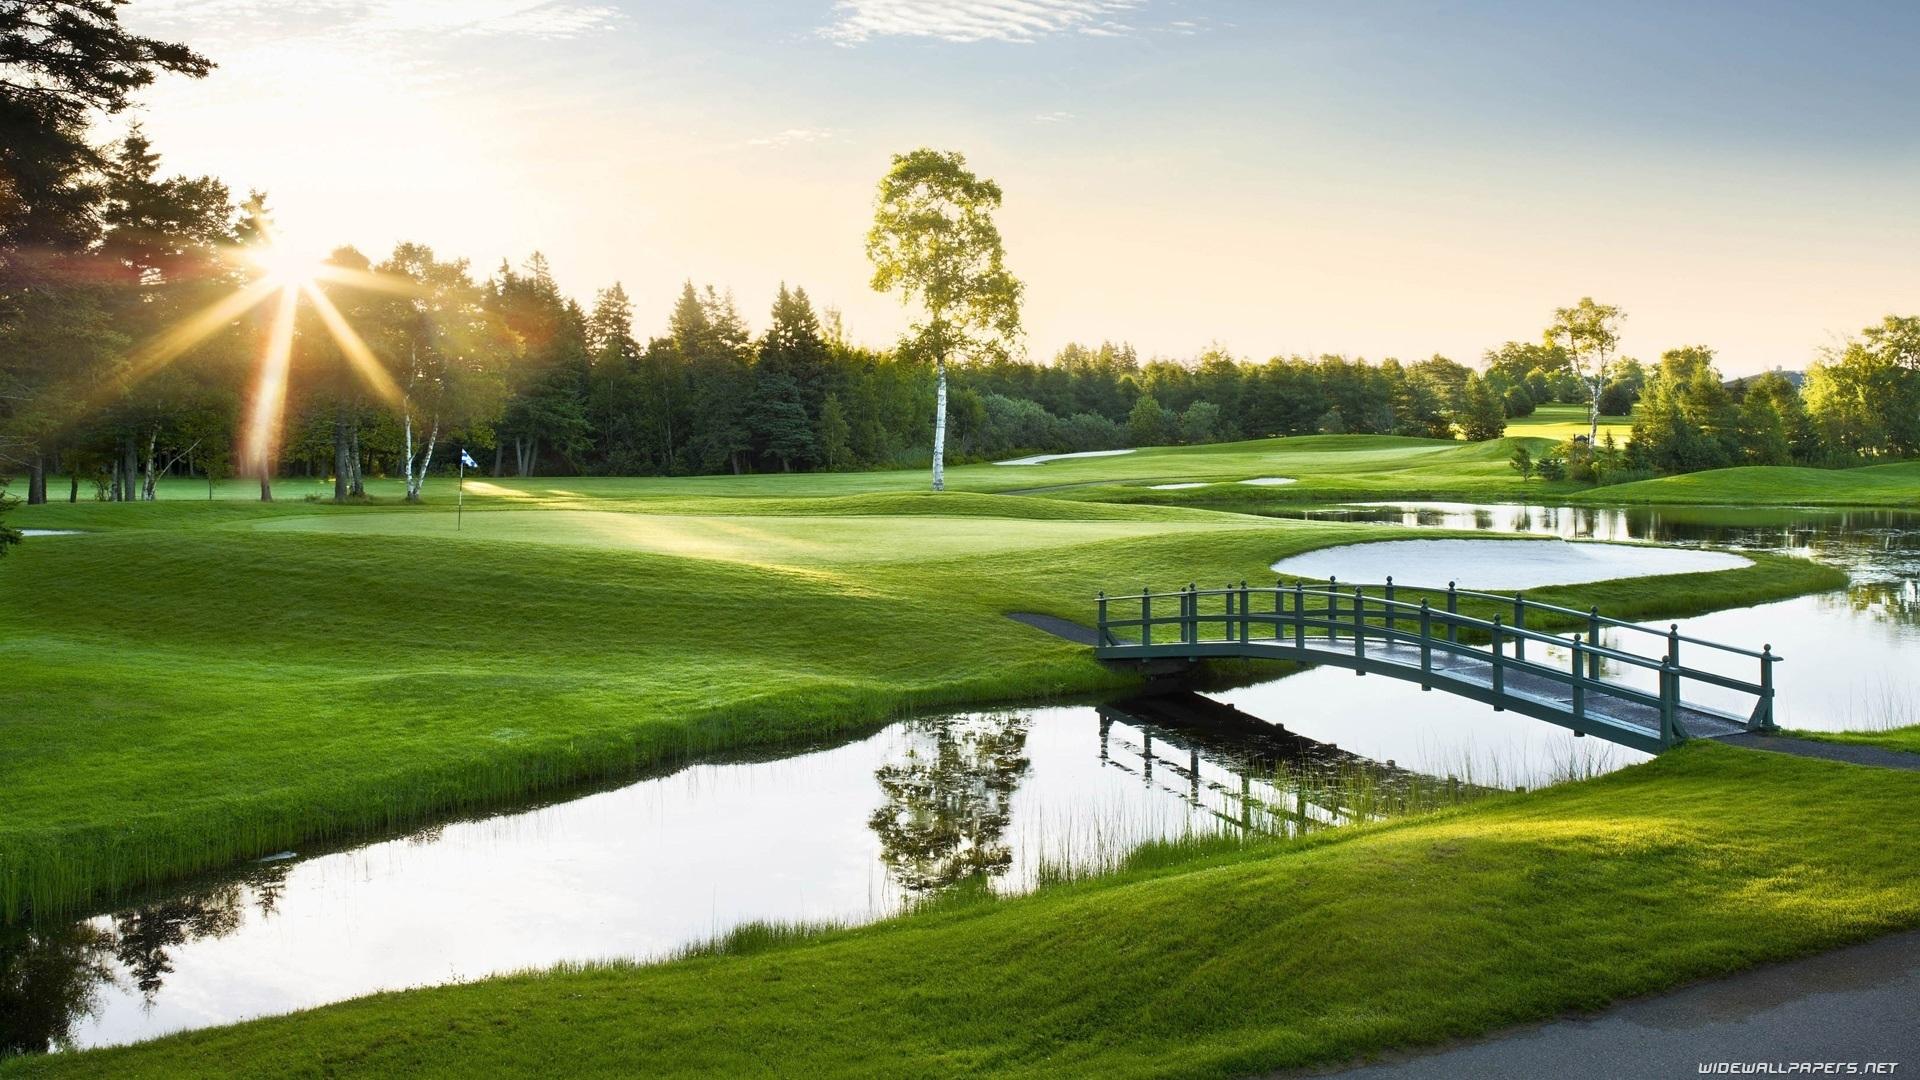 10 Best Most Beautiful Golf Courses Wallpaper FULL HD 1920 ...